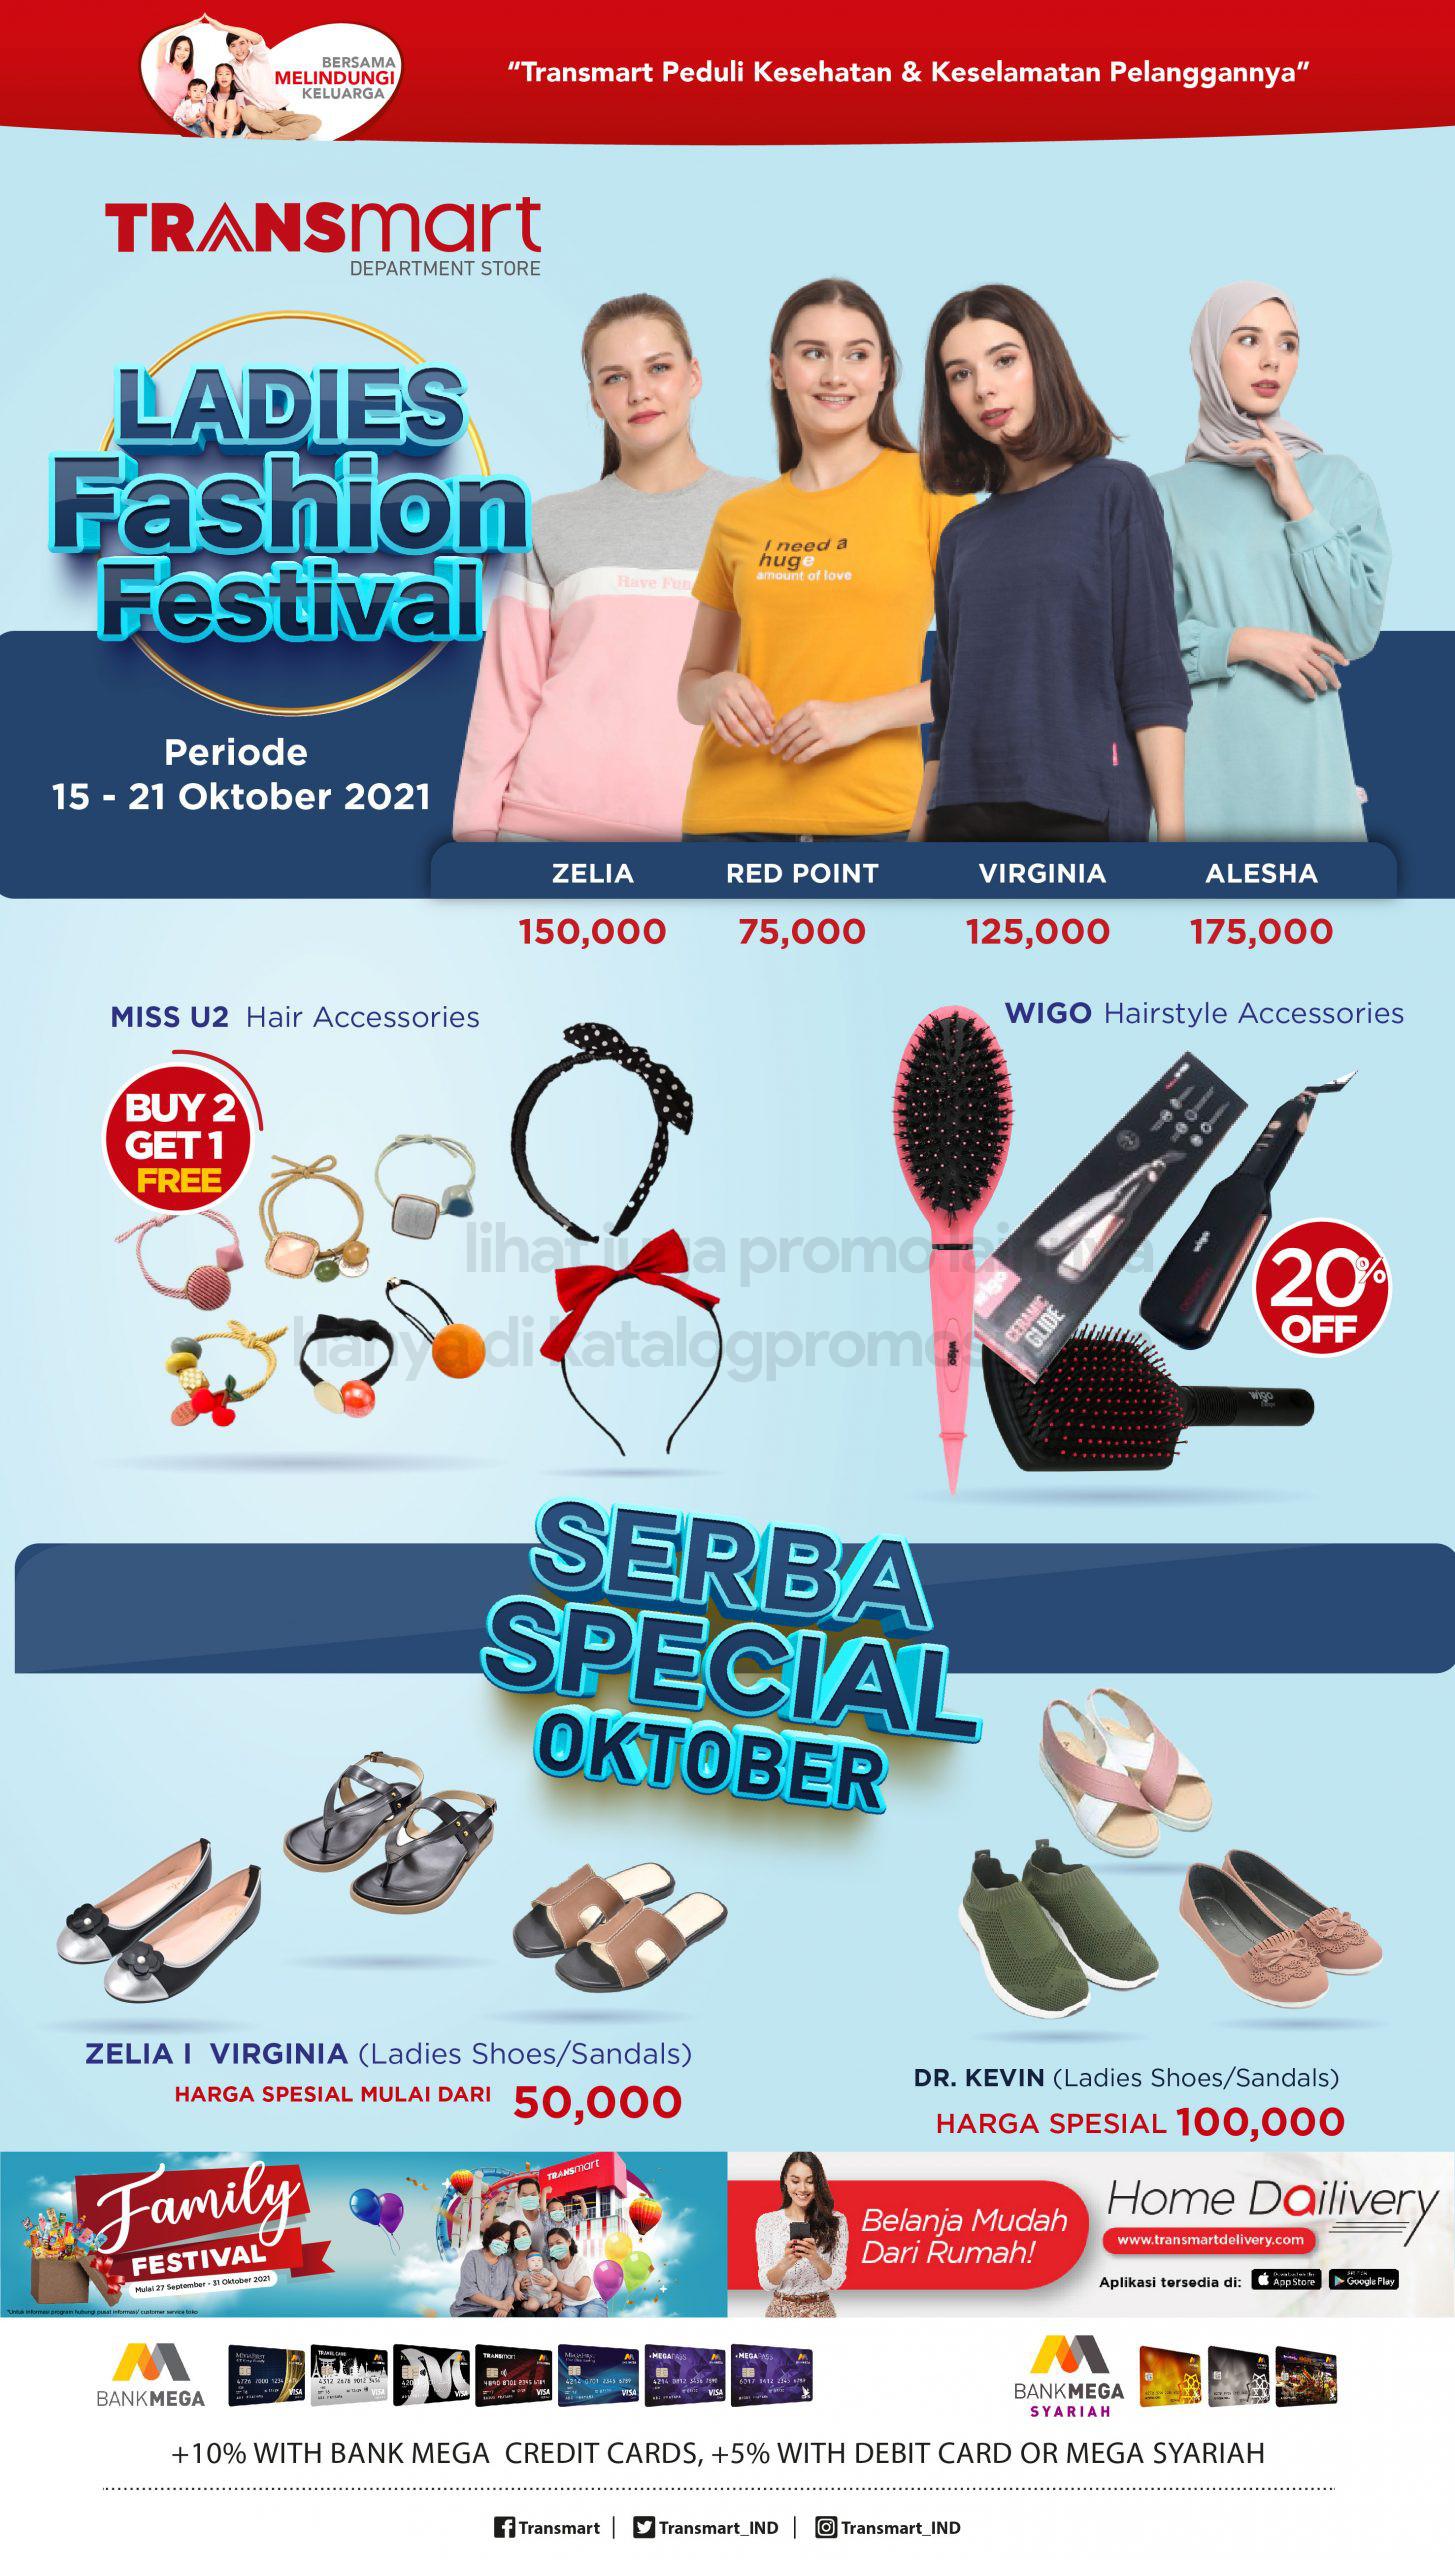 Promo TRANSMART CARREFOUR Katalog Weekend JSM periode 15-19 Oktober 2021